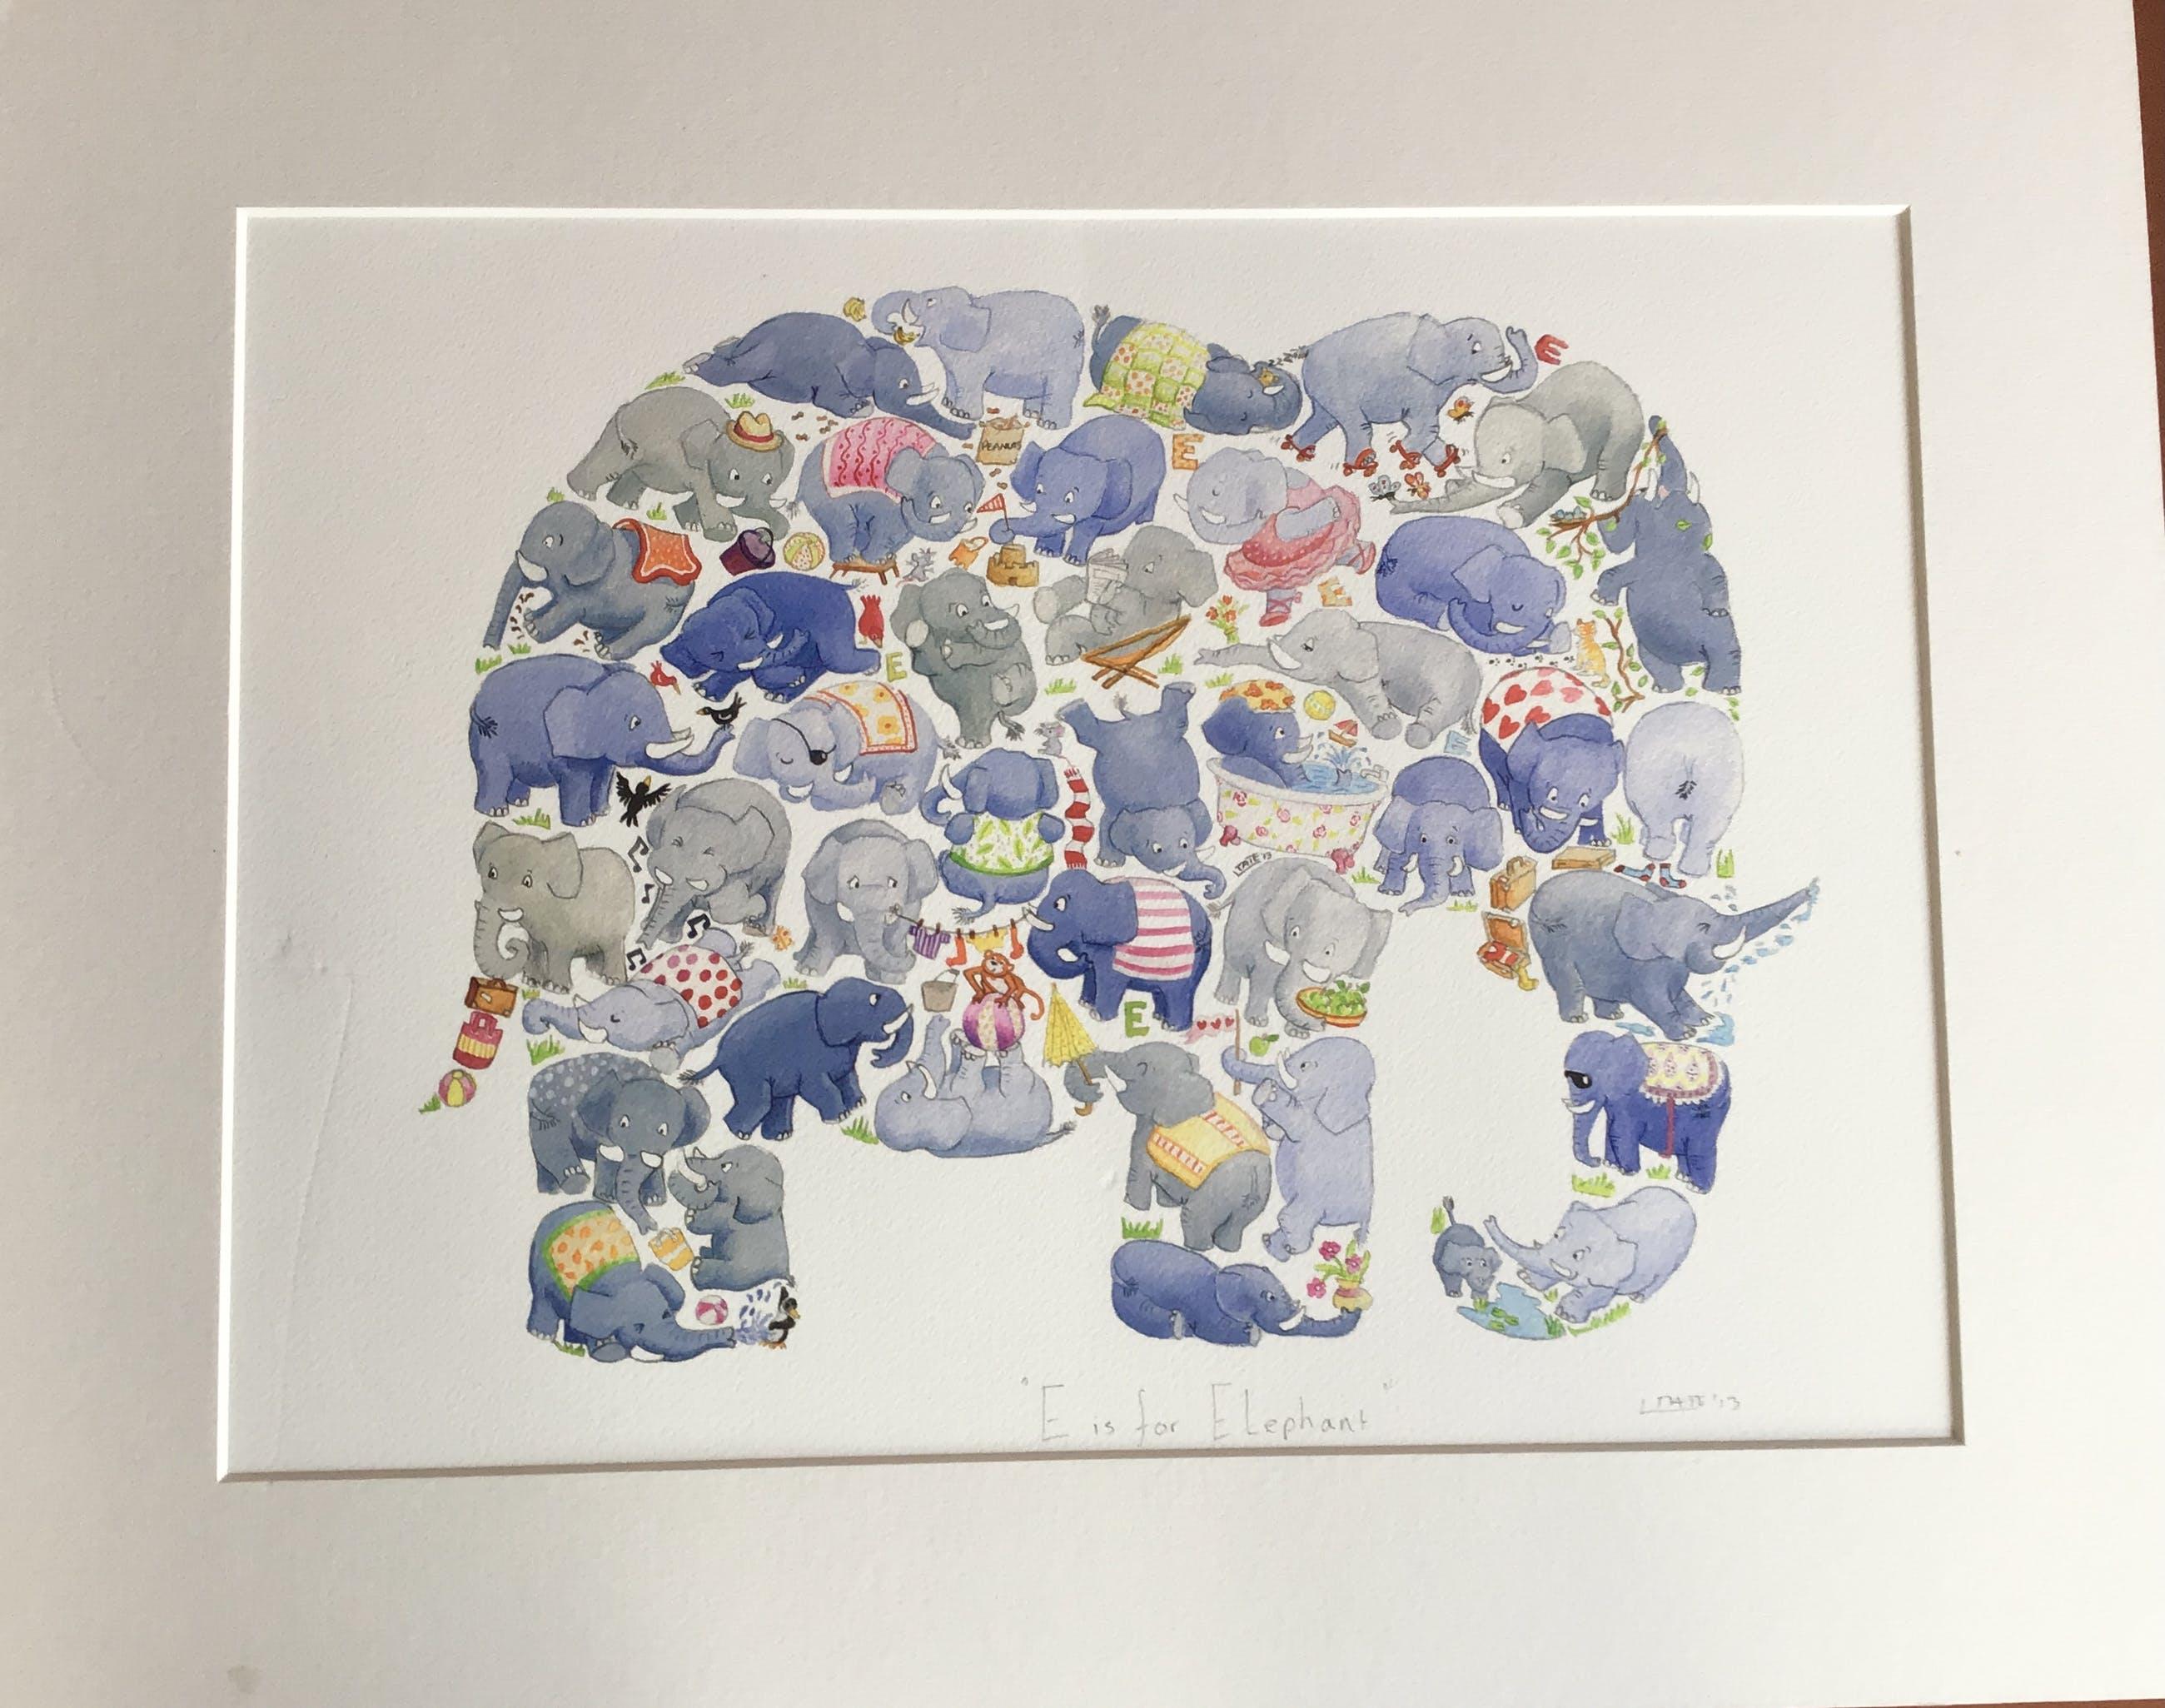 Louise Tate, zeefdruk E is for Elephant, gesigneerd kopen? Bied vanaf 1!